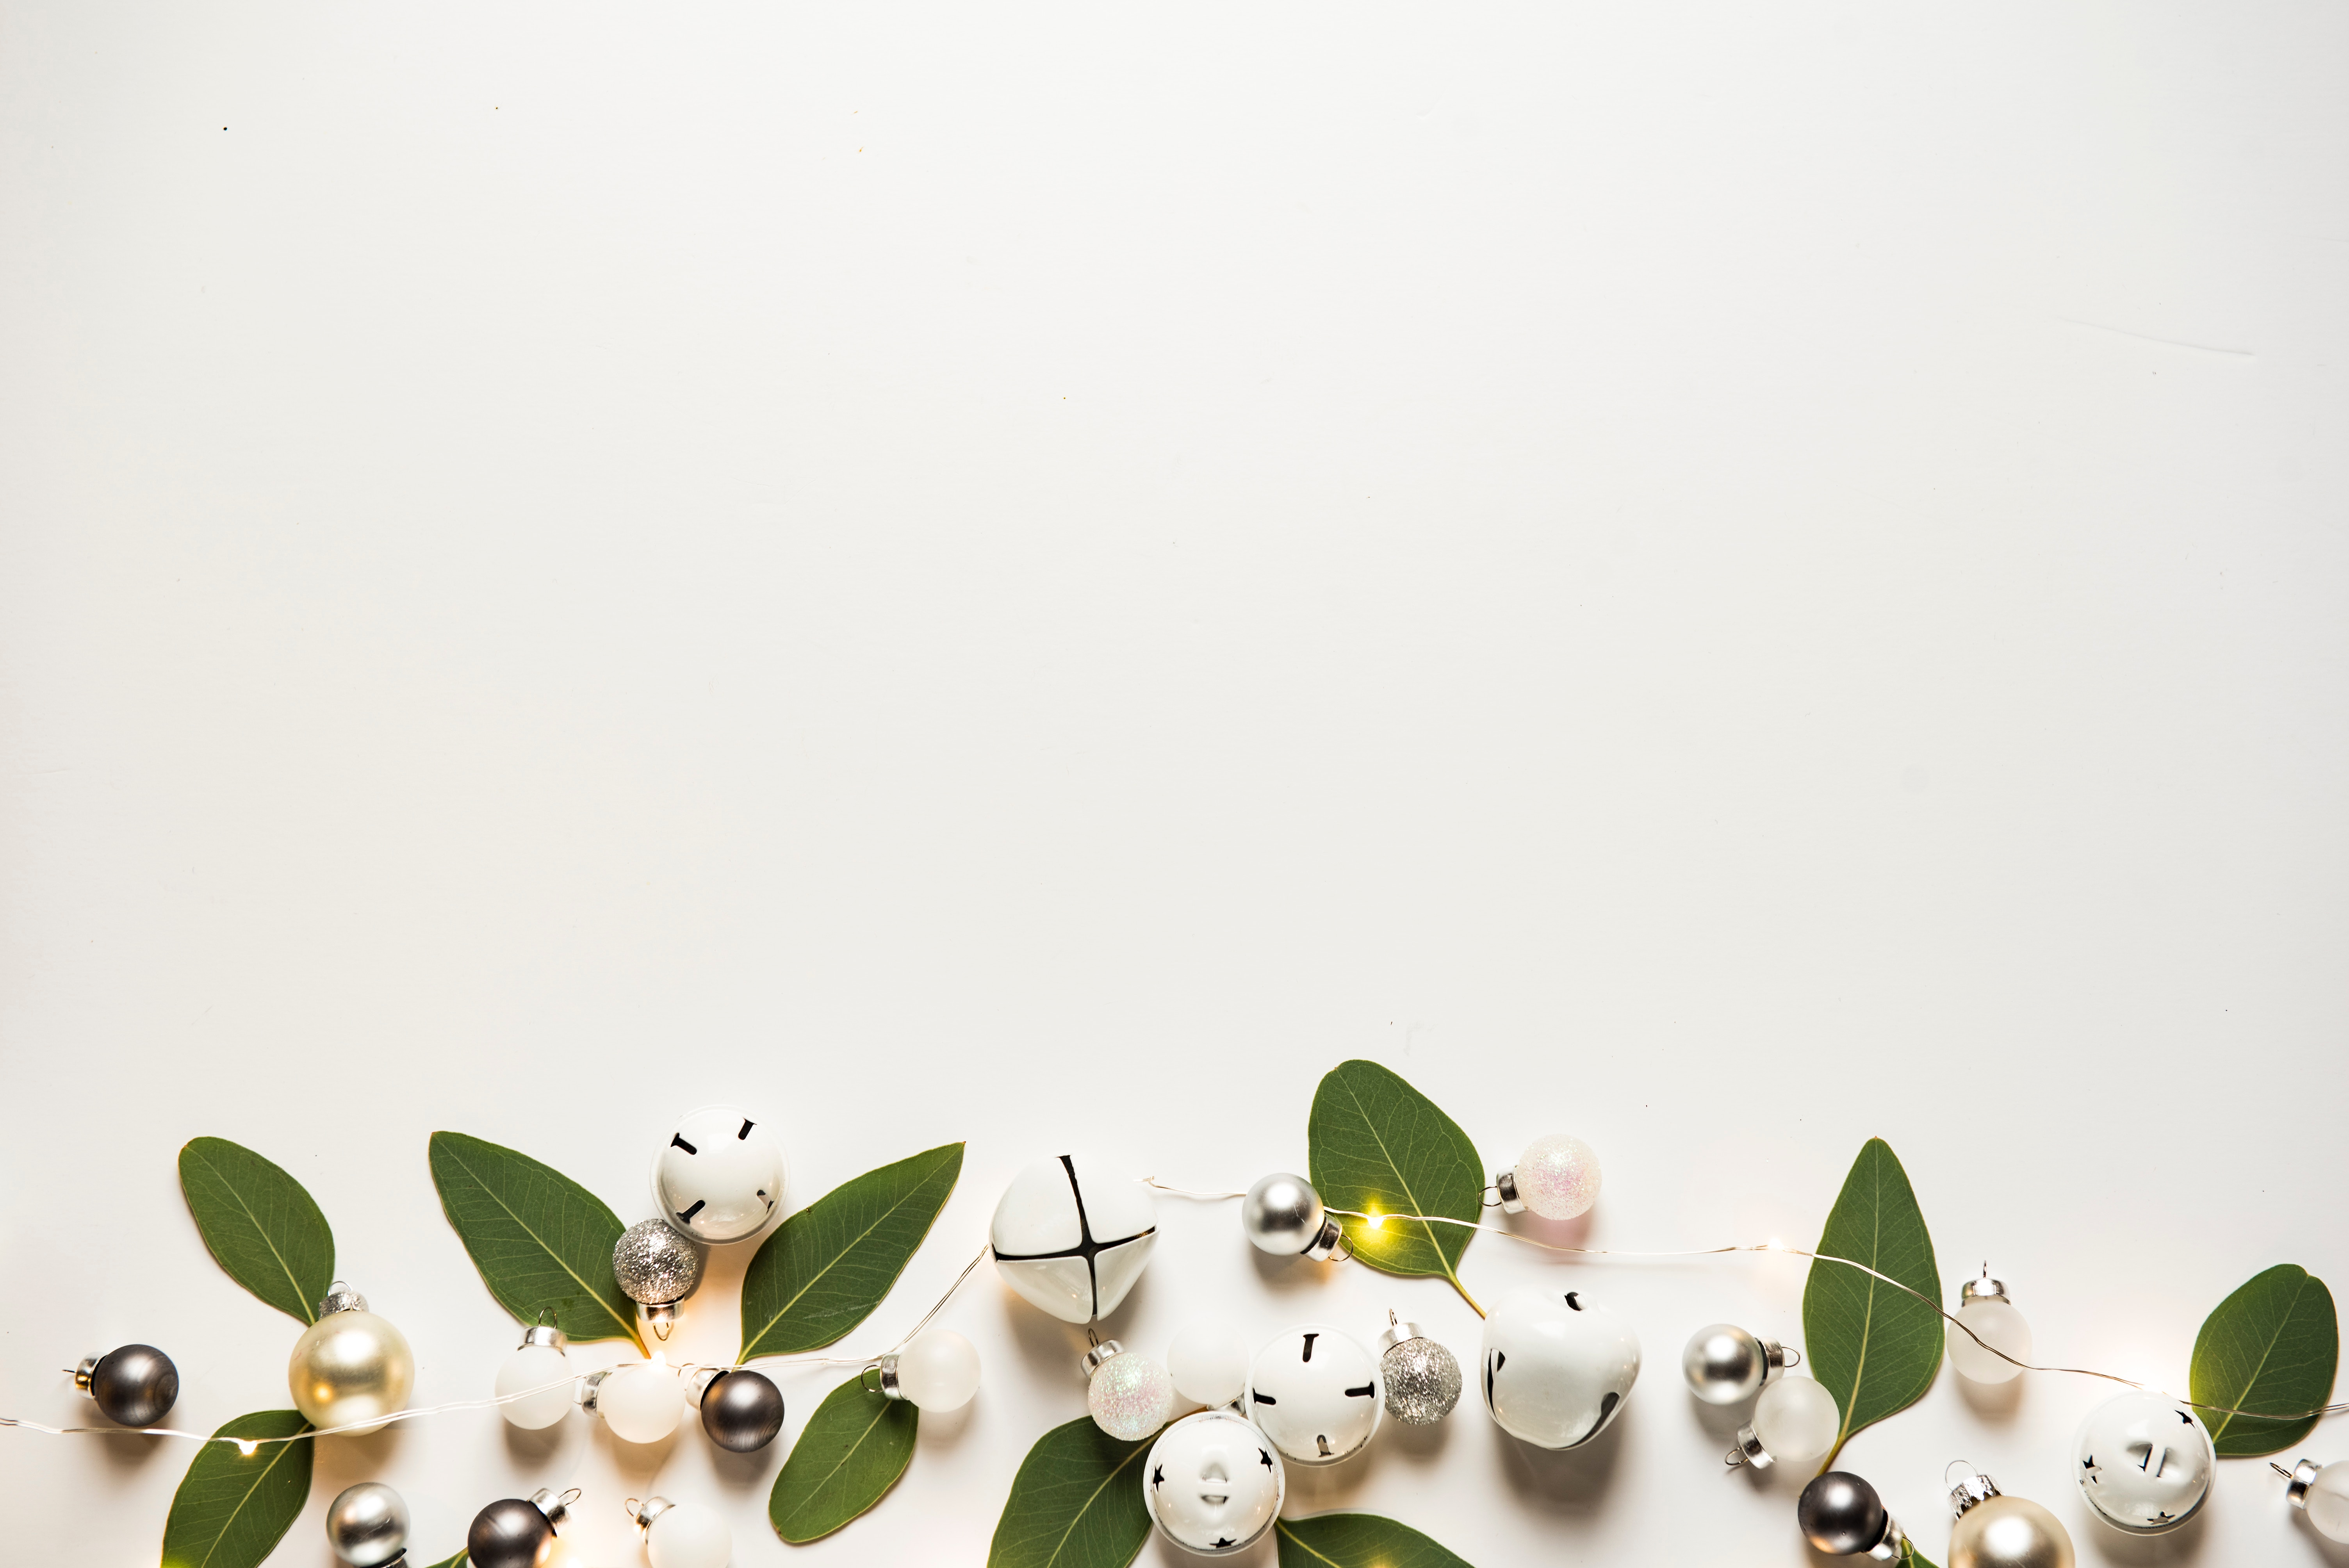 Chinese Christmas carol 中文聖誕歌